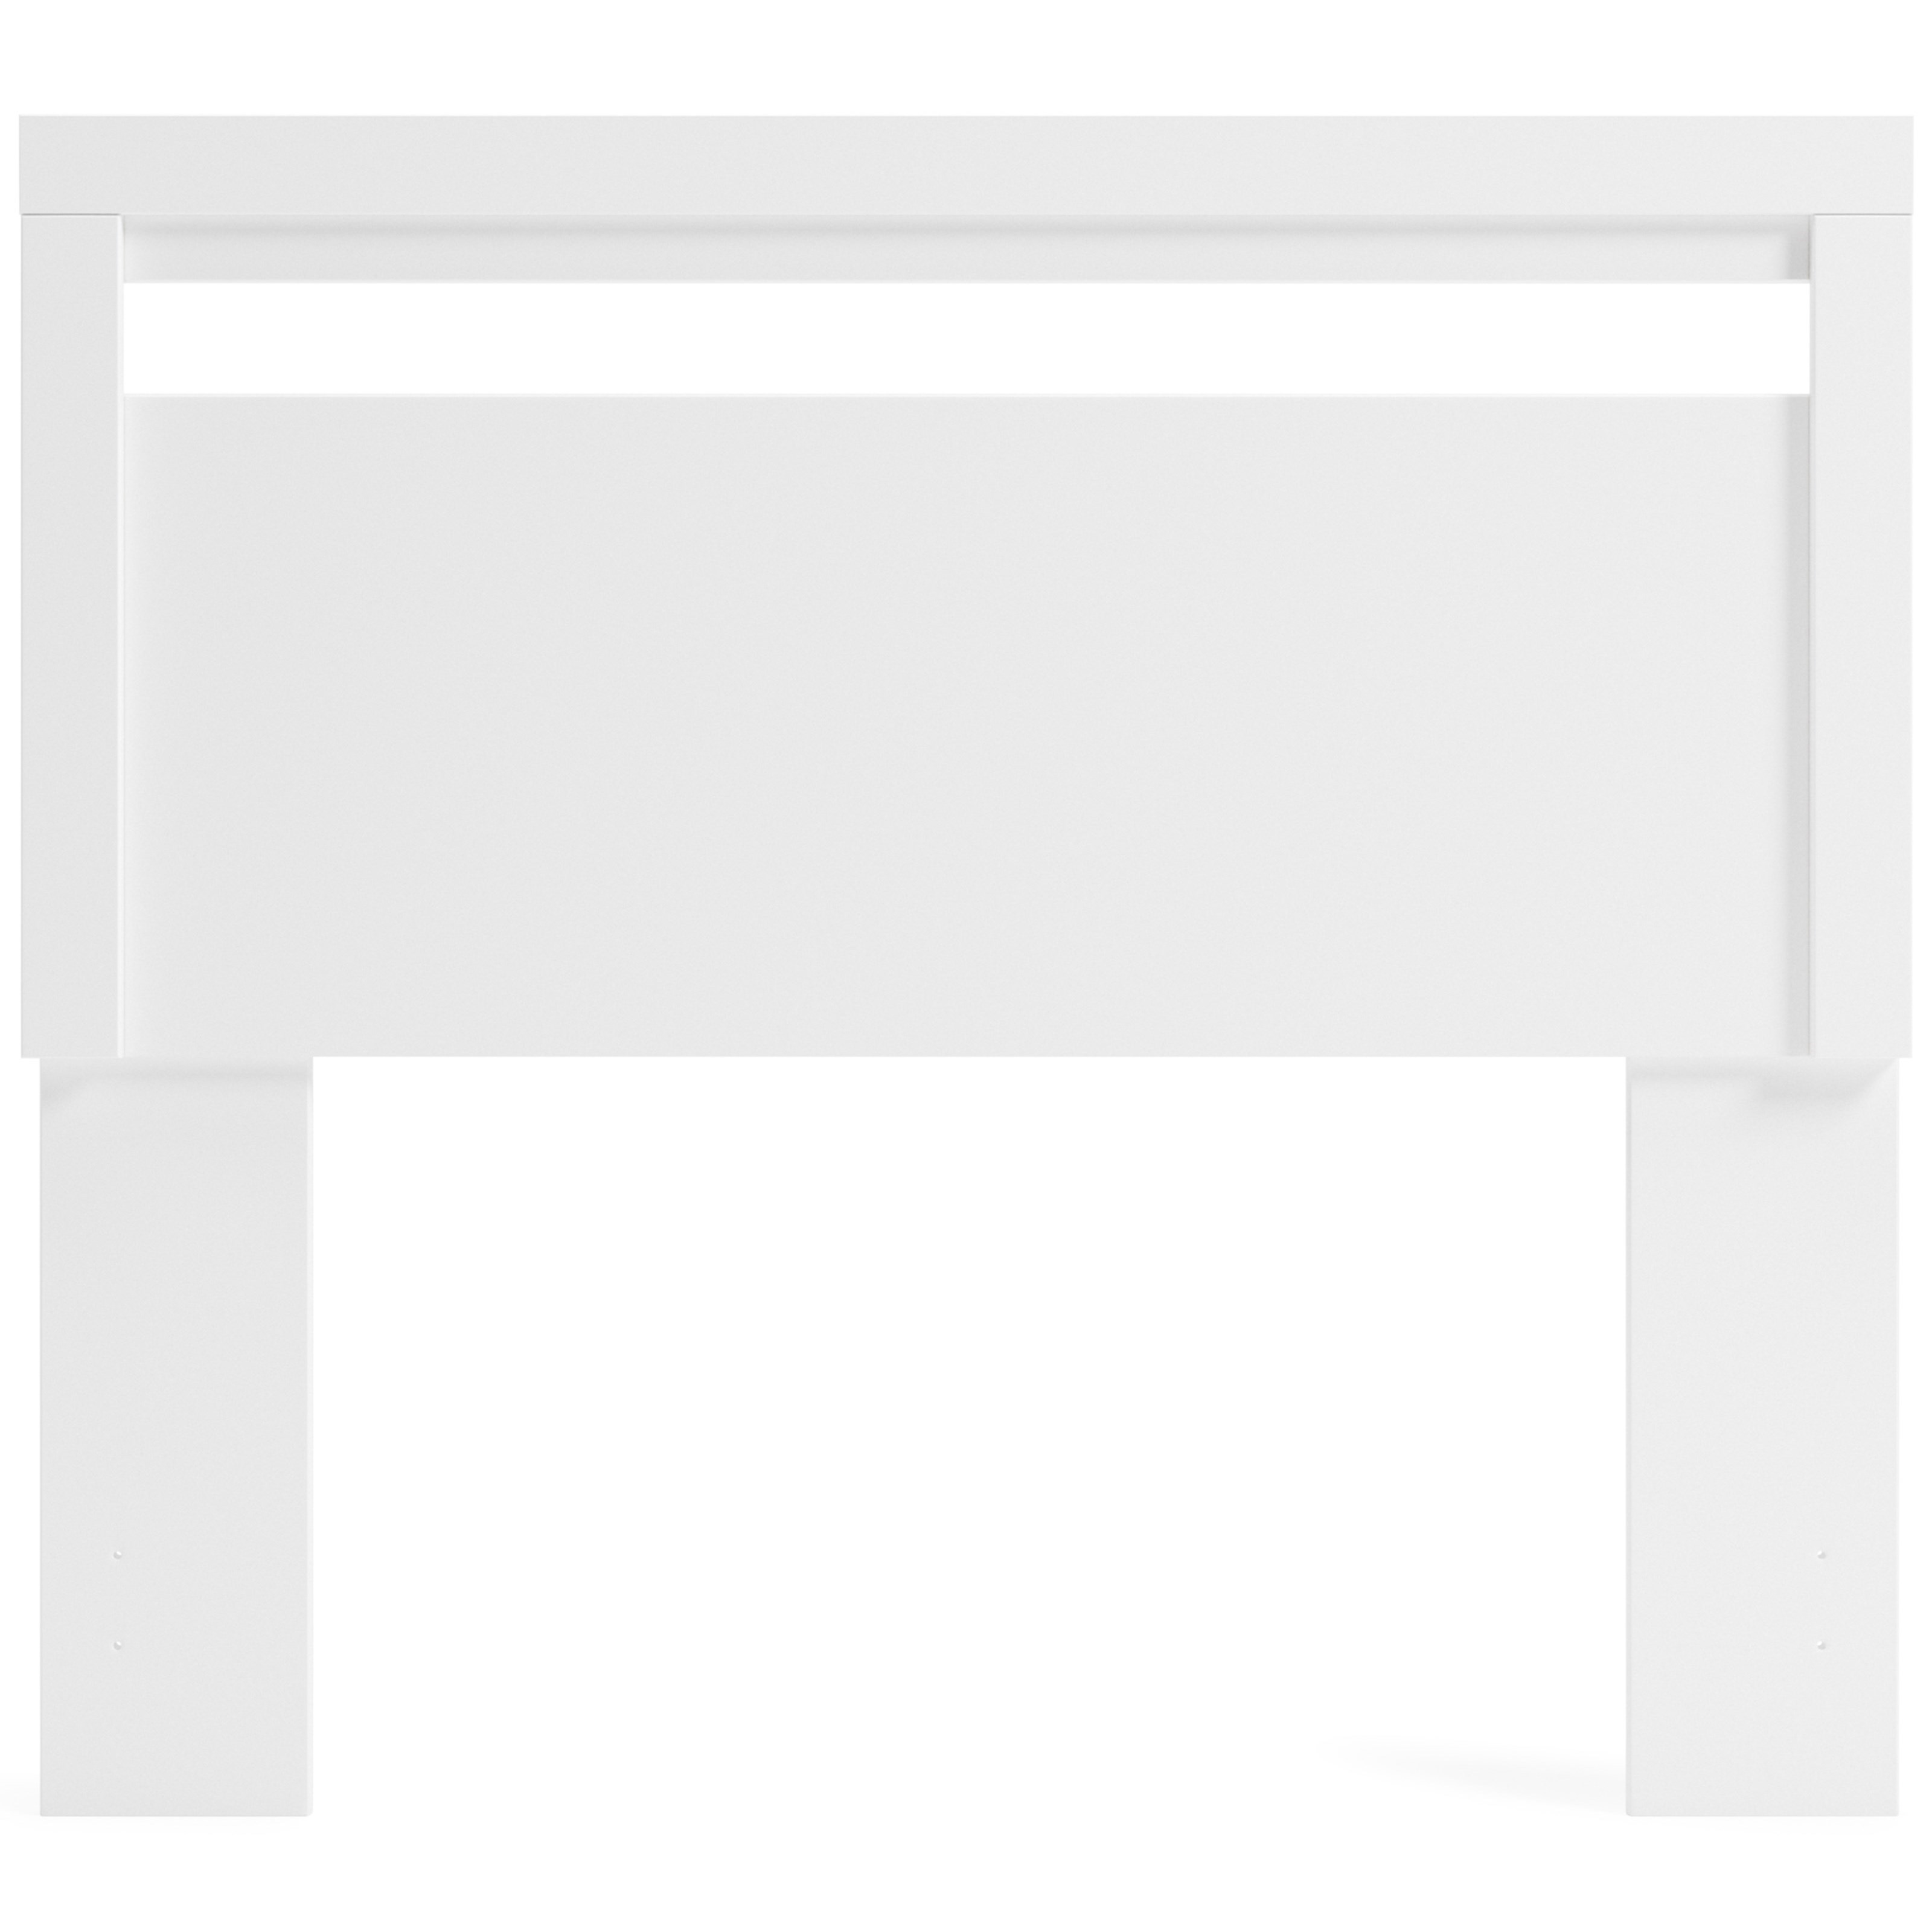 Flannia Full Panel Headboard by Ashley (Signature Design) at Johnny Janosik